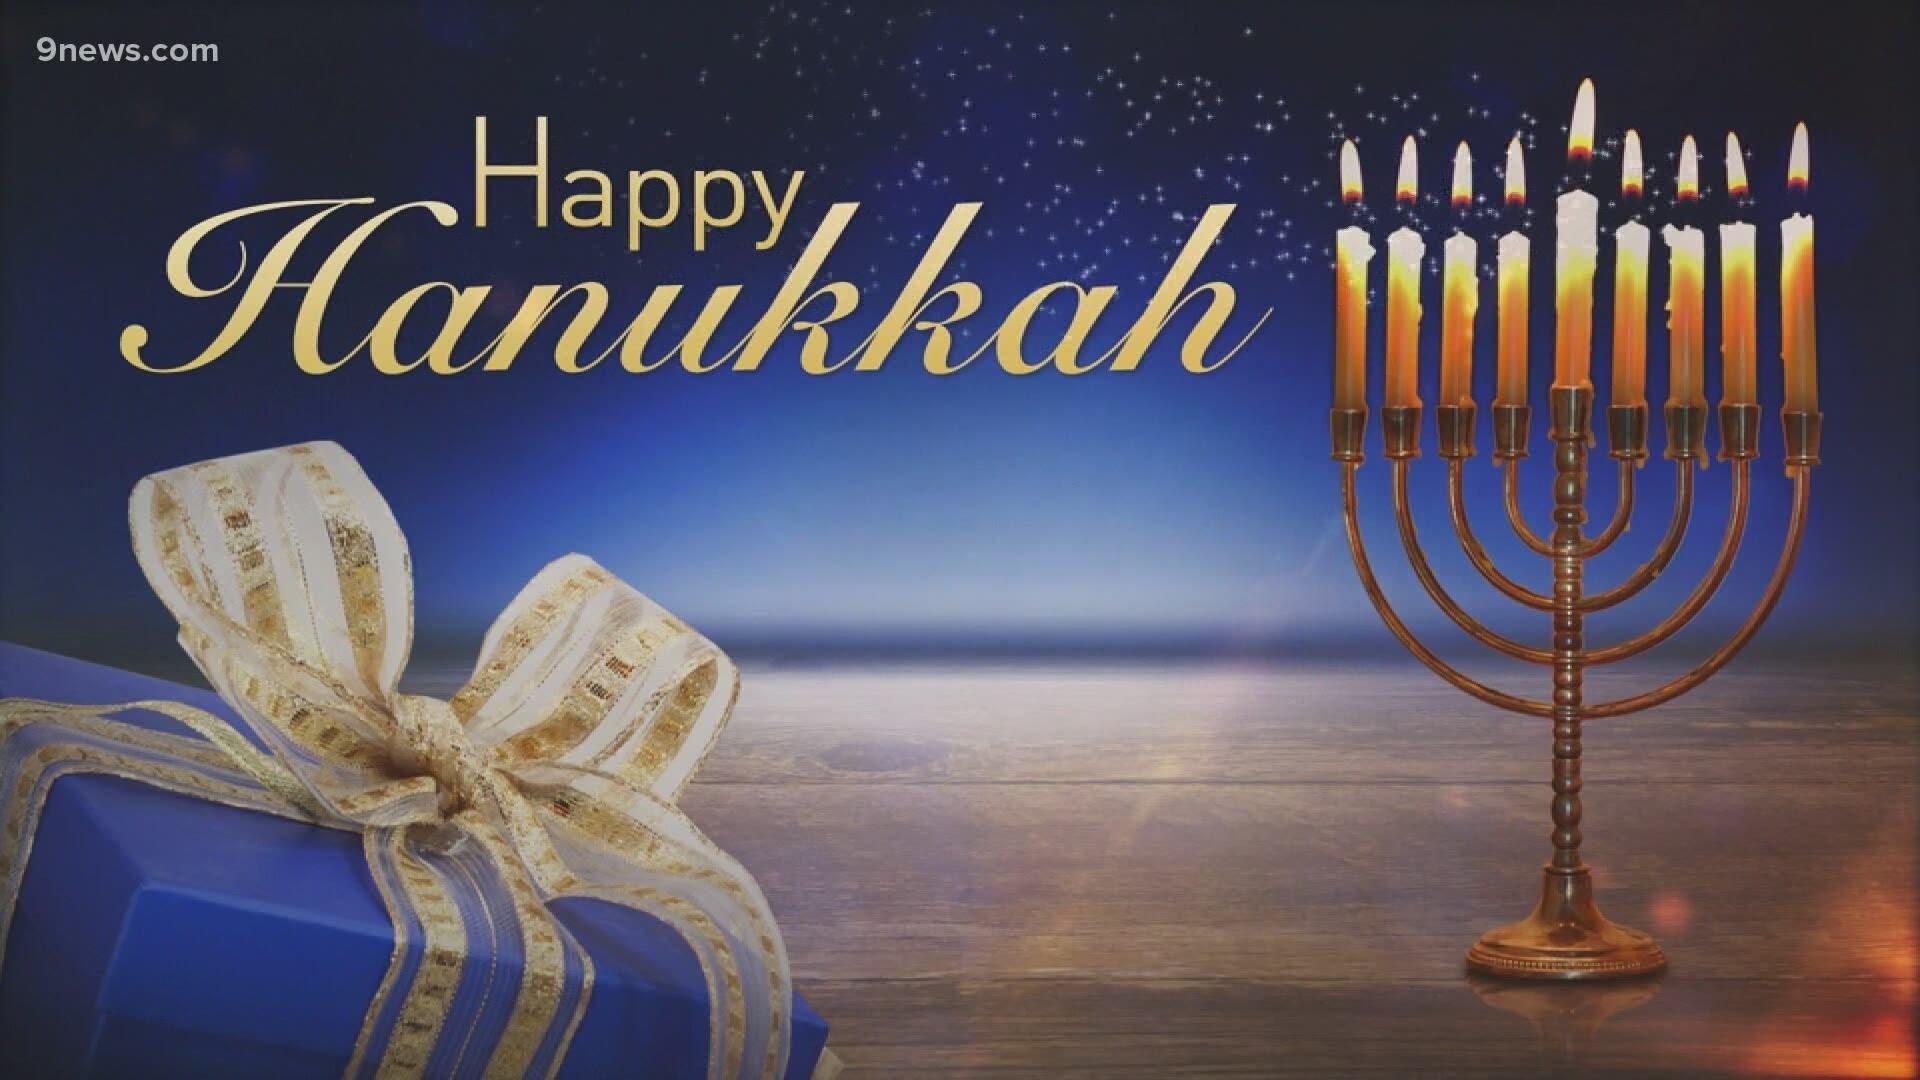 Hanukkah Celebrations To Be Held Virtually This Year 9news Com